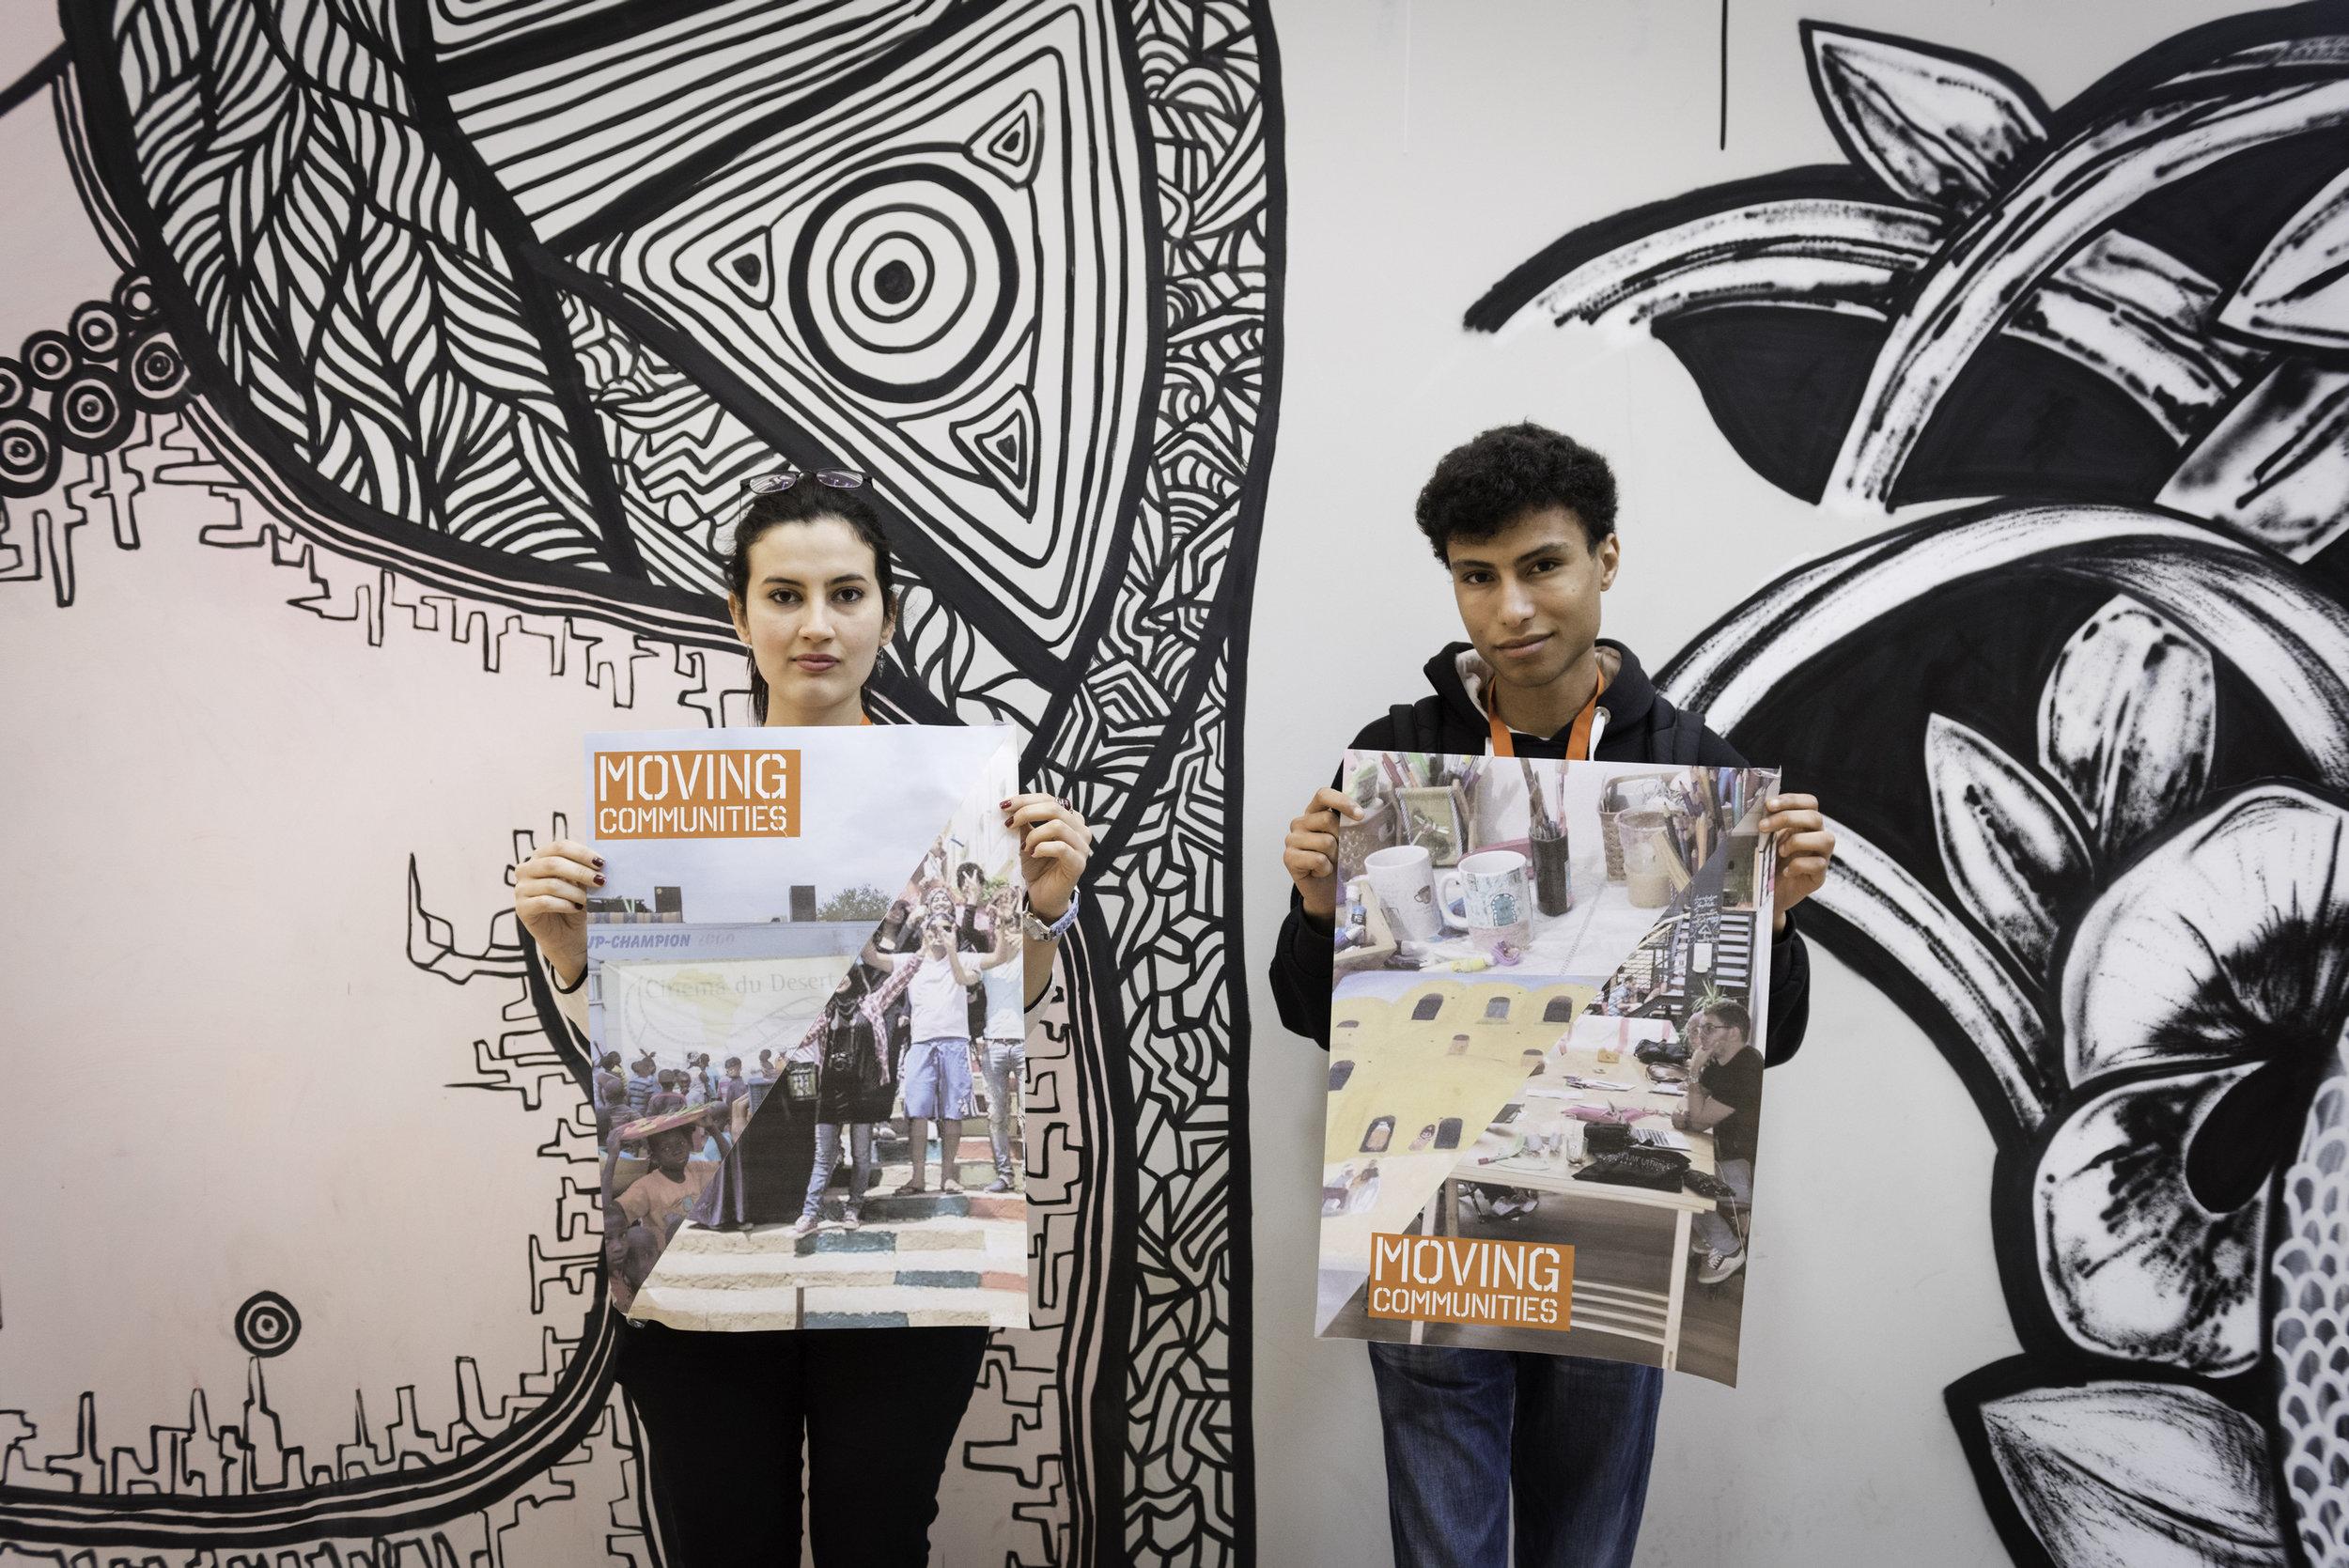 Idea Makers Yosser Belghith and Mondher Tounsi at the Idea Camp 2017. Photo by César Lucas Abreu